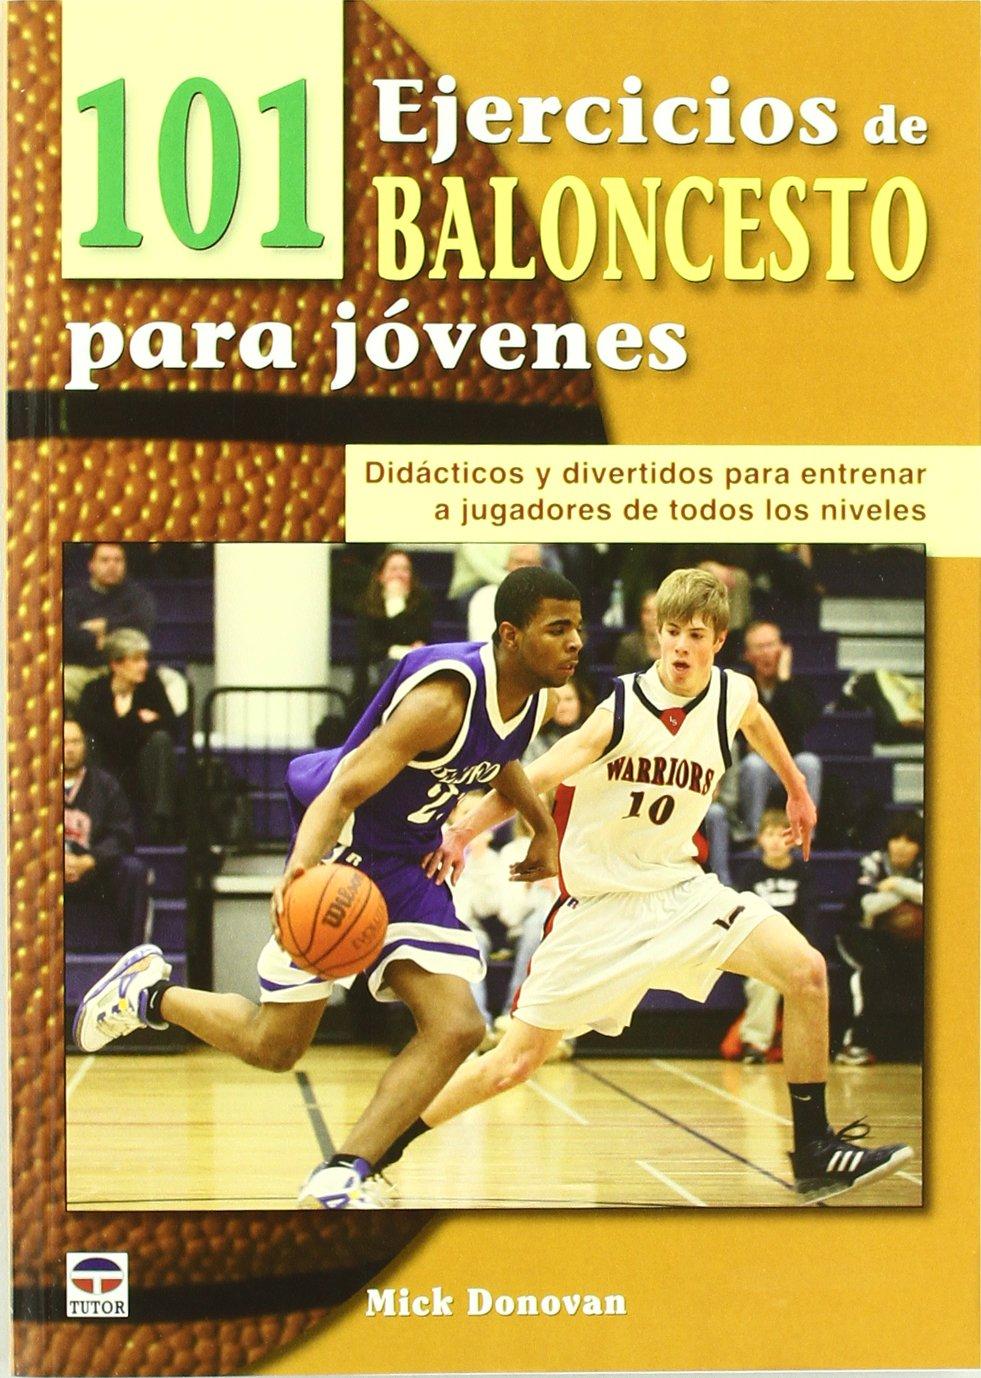 101 EJERCICOS DE BALONCESTO PARA JÓVENES (Baloncesto (tutor)) Tapa blanda – 1 oct 2011 Mick Donova 8479028904 Basketball - General Spanish: Adult Nonfiction